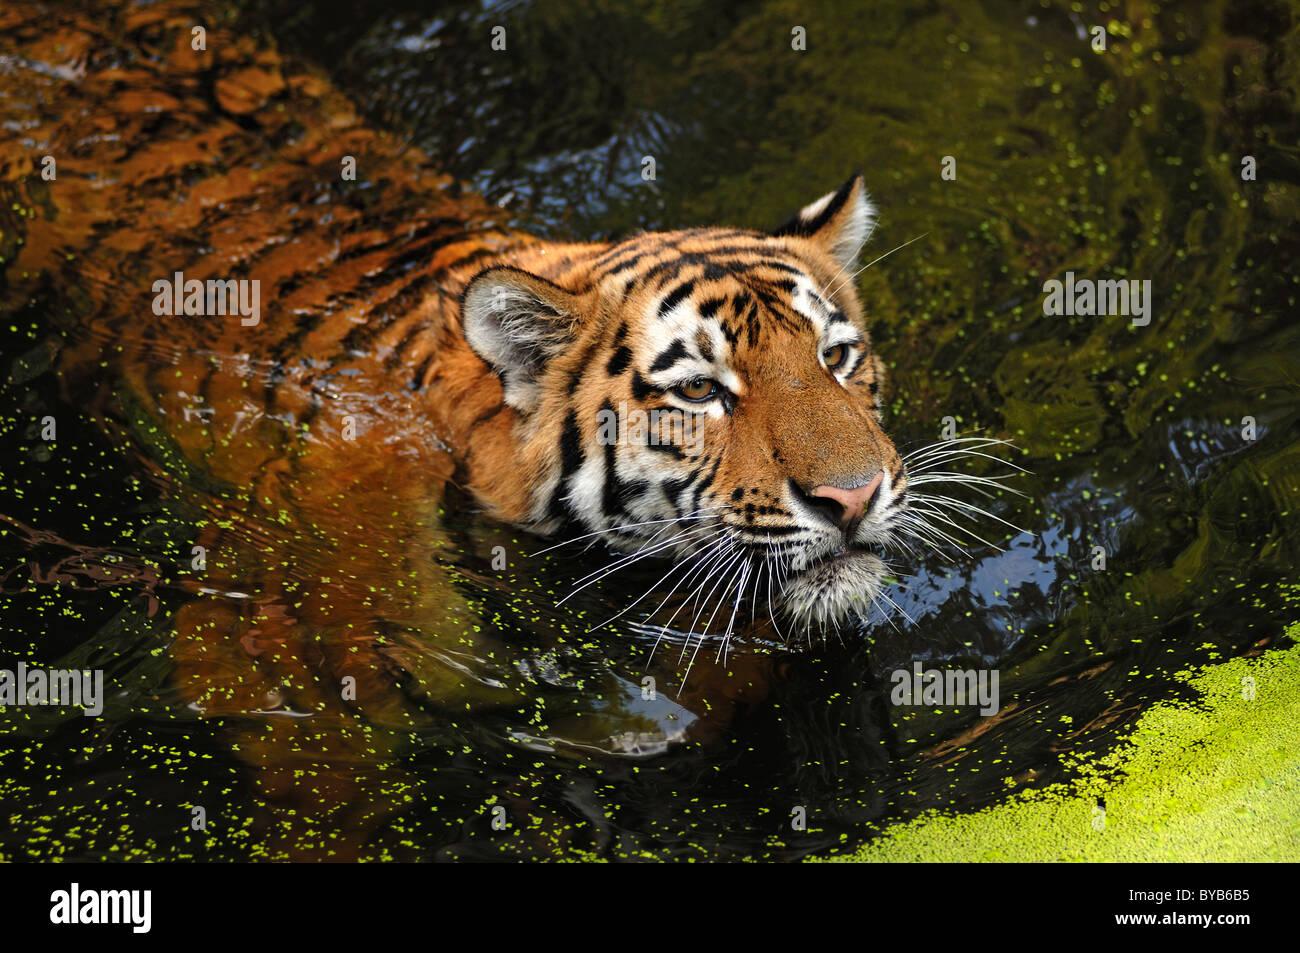 Siberian Tiger (Panthera tigris altaica), swimming in a moat, Tiergarten Nuernberg, Nuremburg Zoo, Nuremburg, Middle - Stock Image